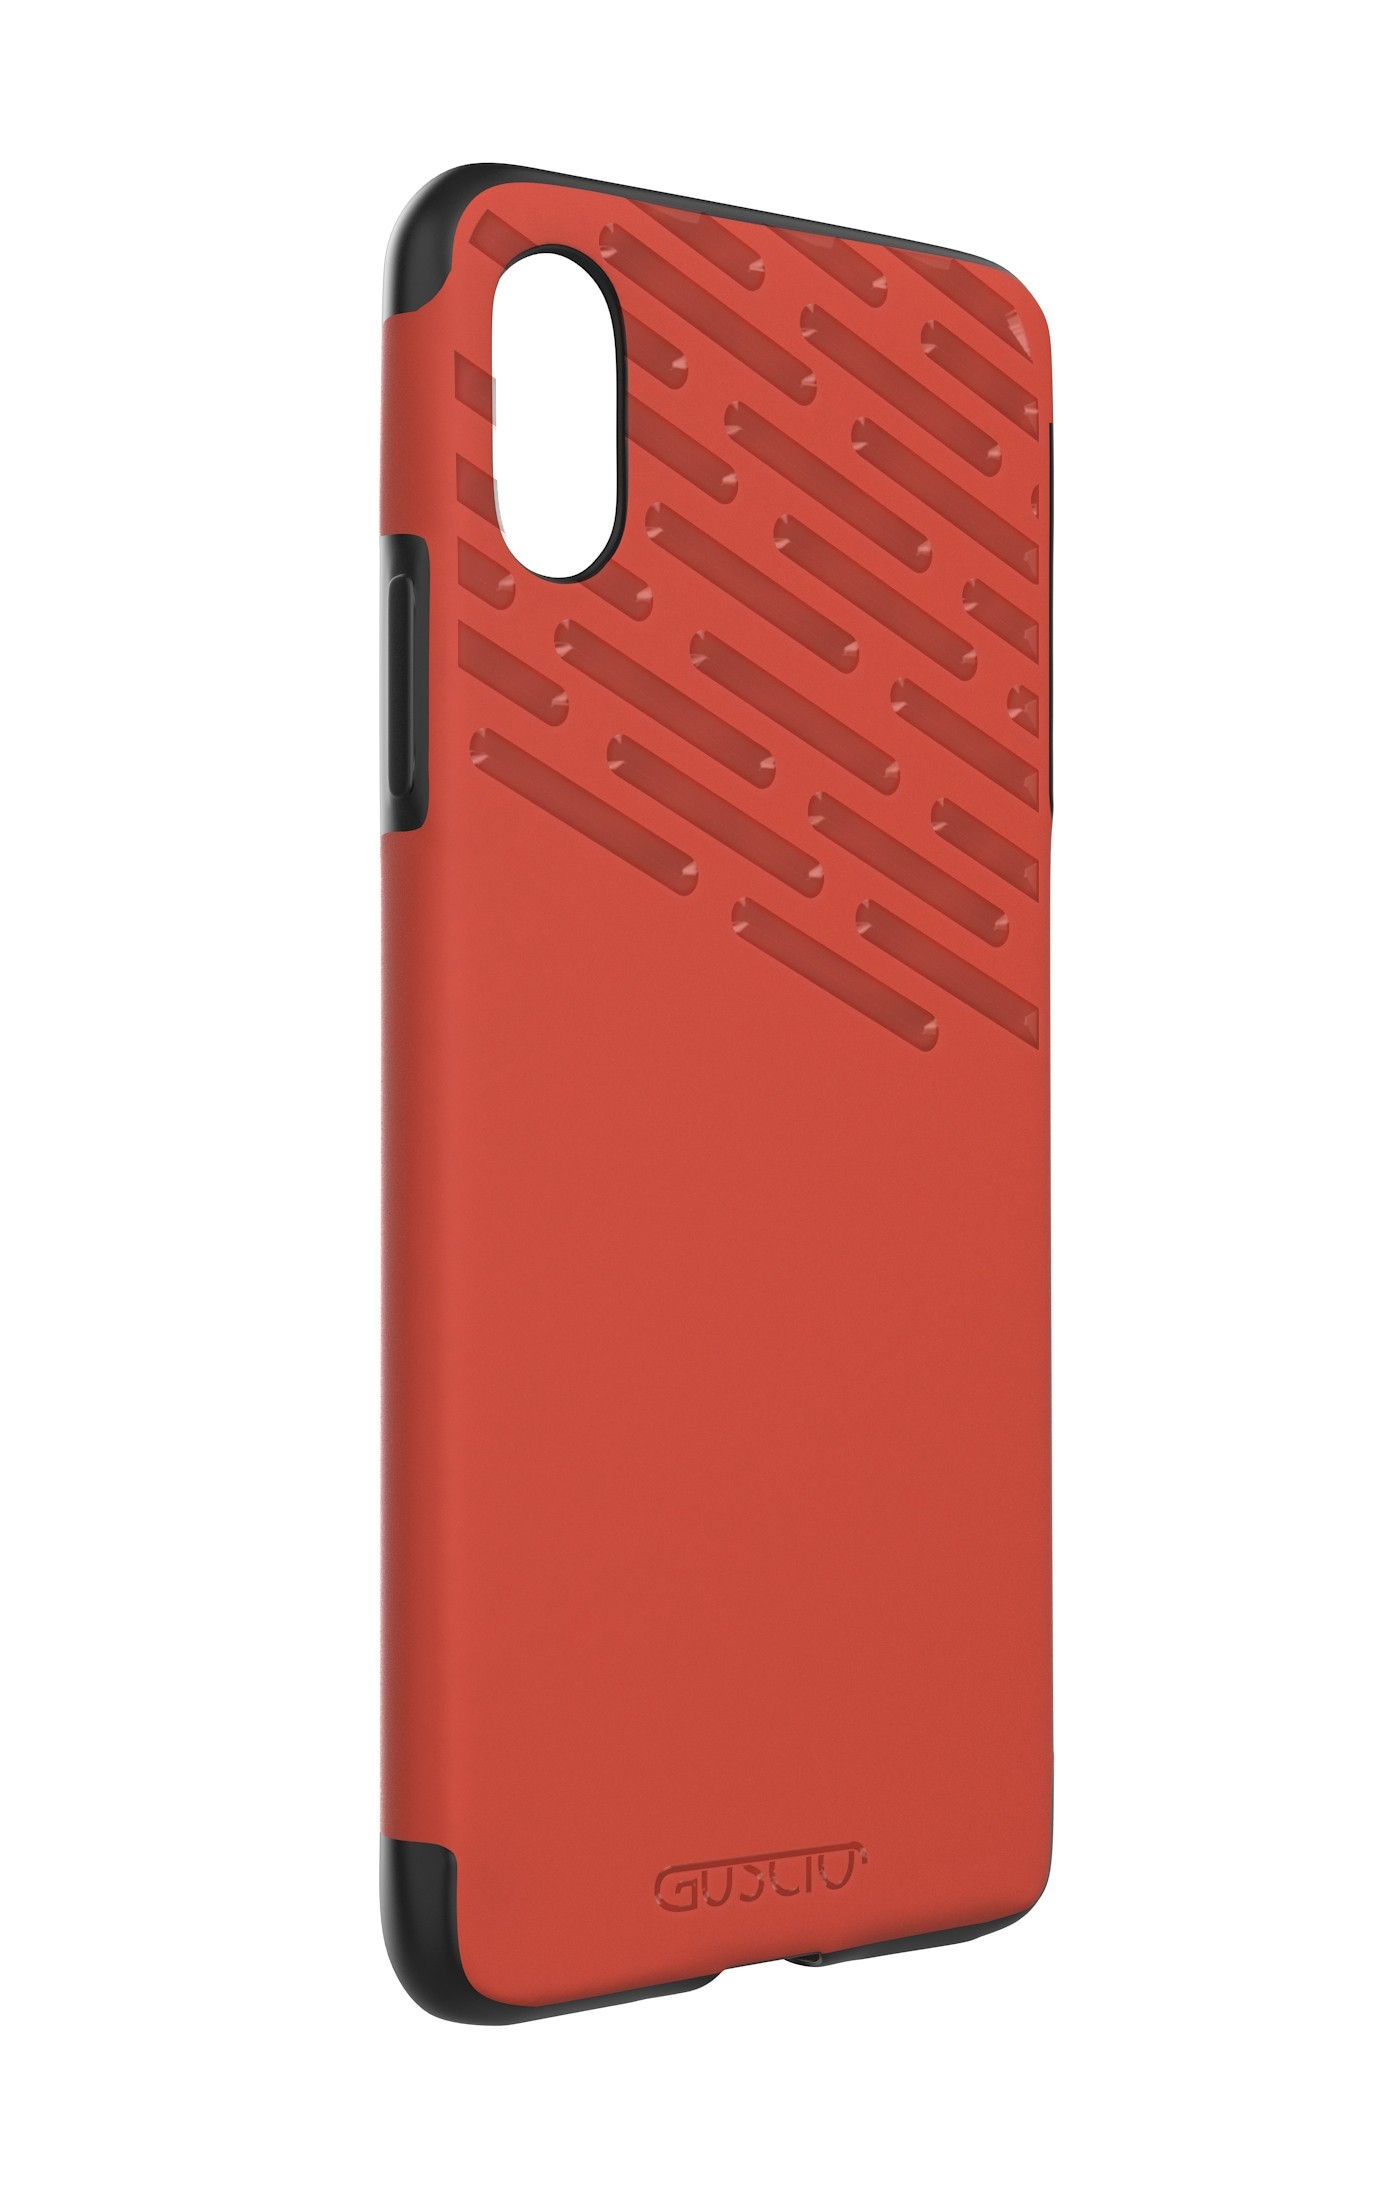 COVER APPLE IPHONE X/XS - Gusciostore